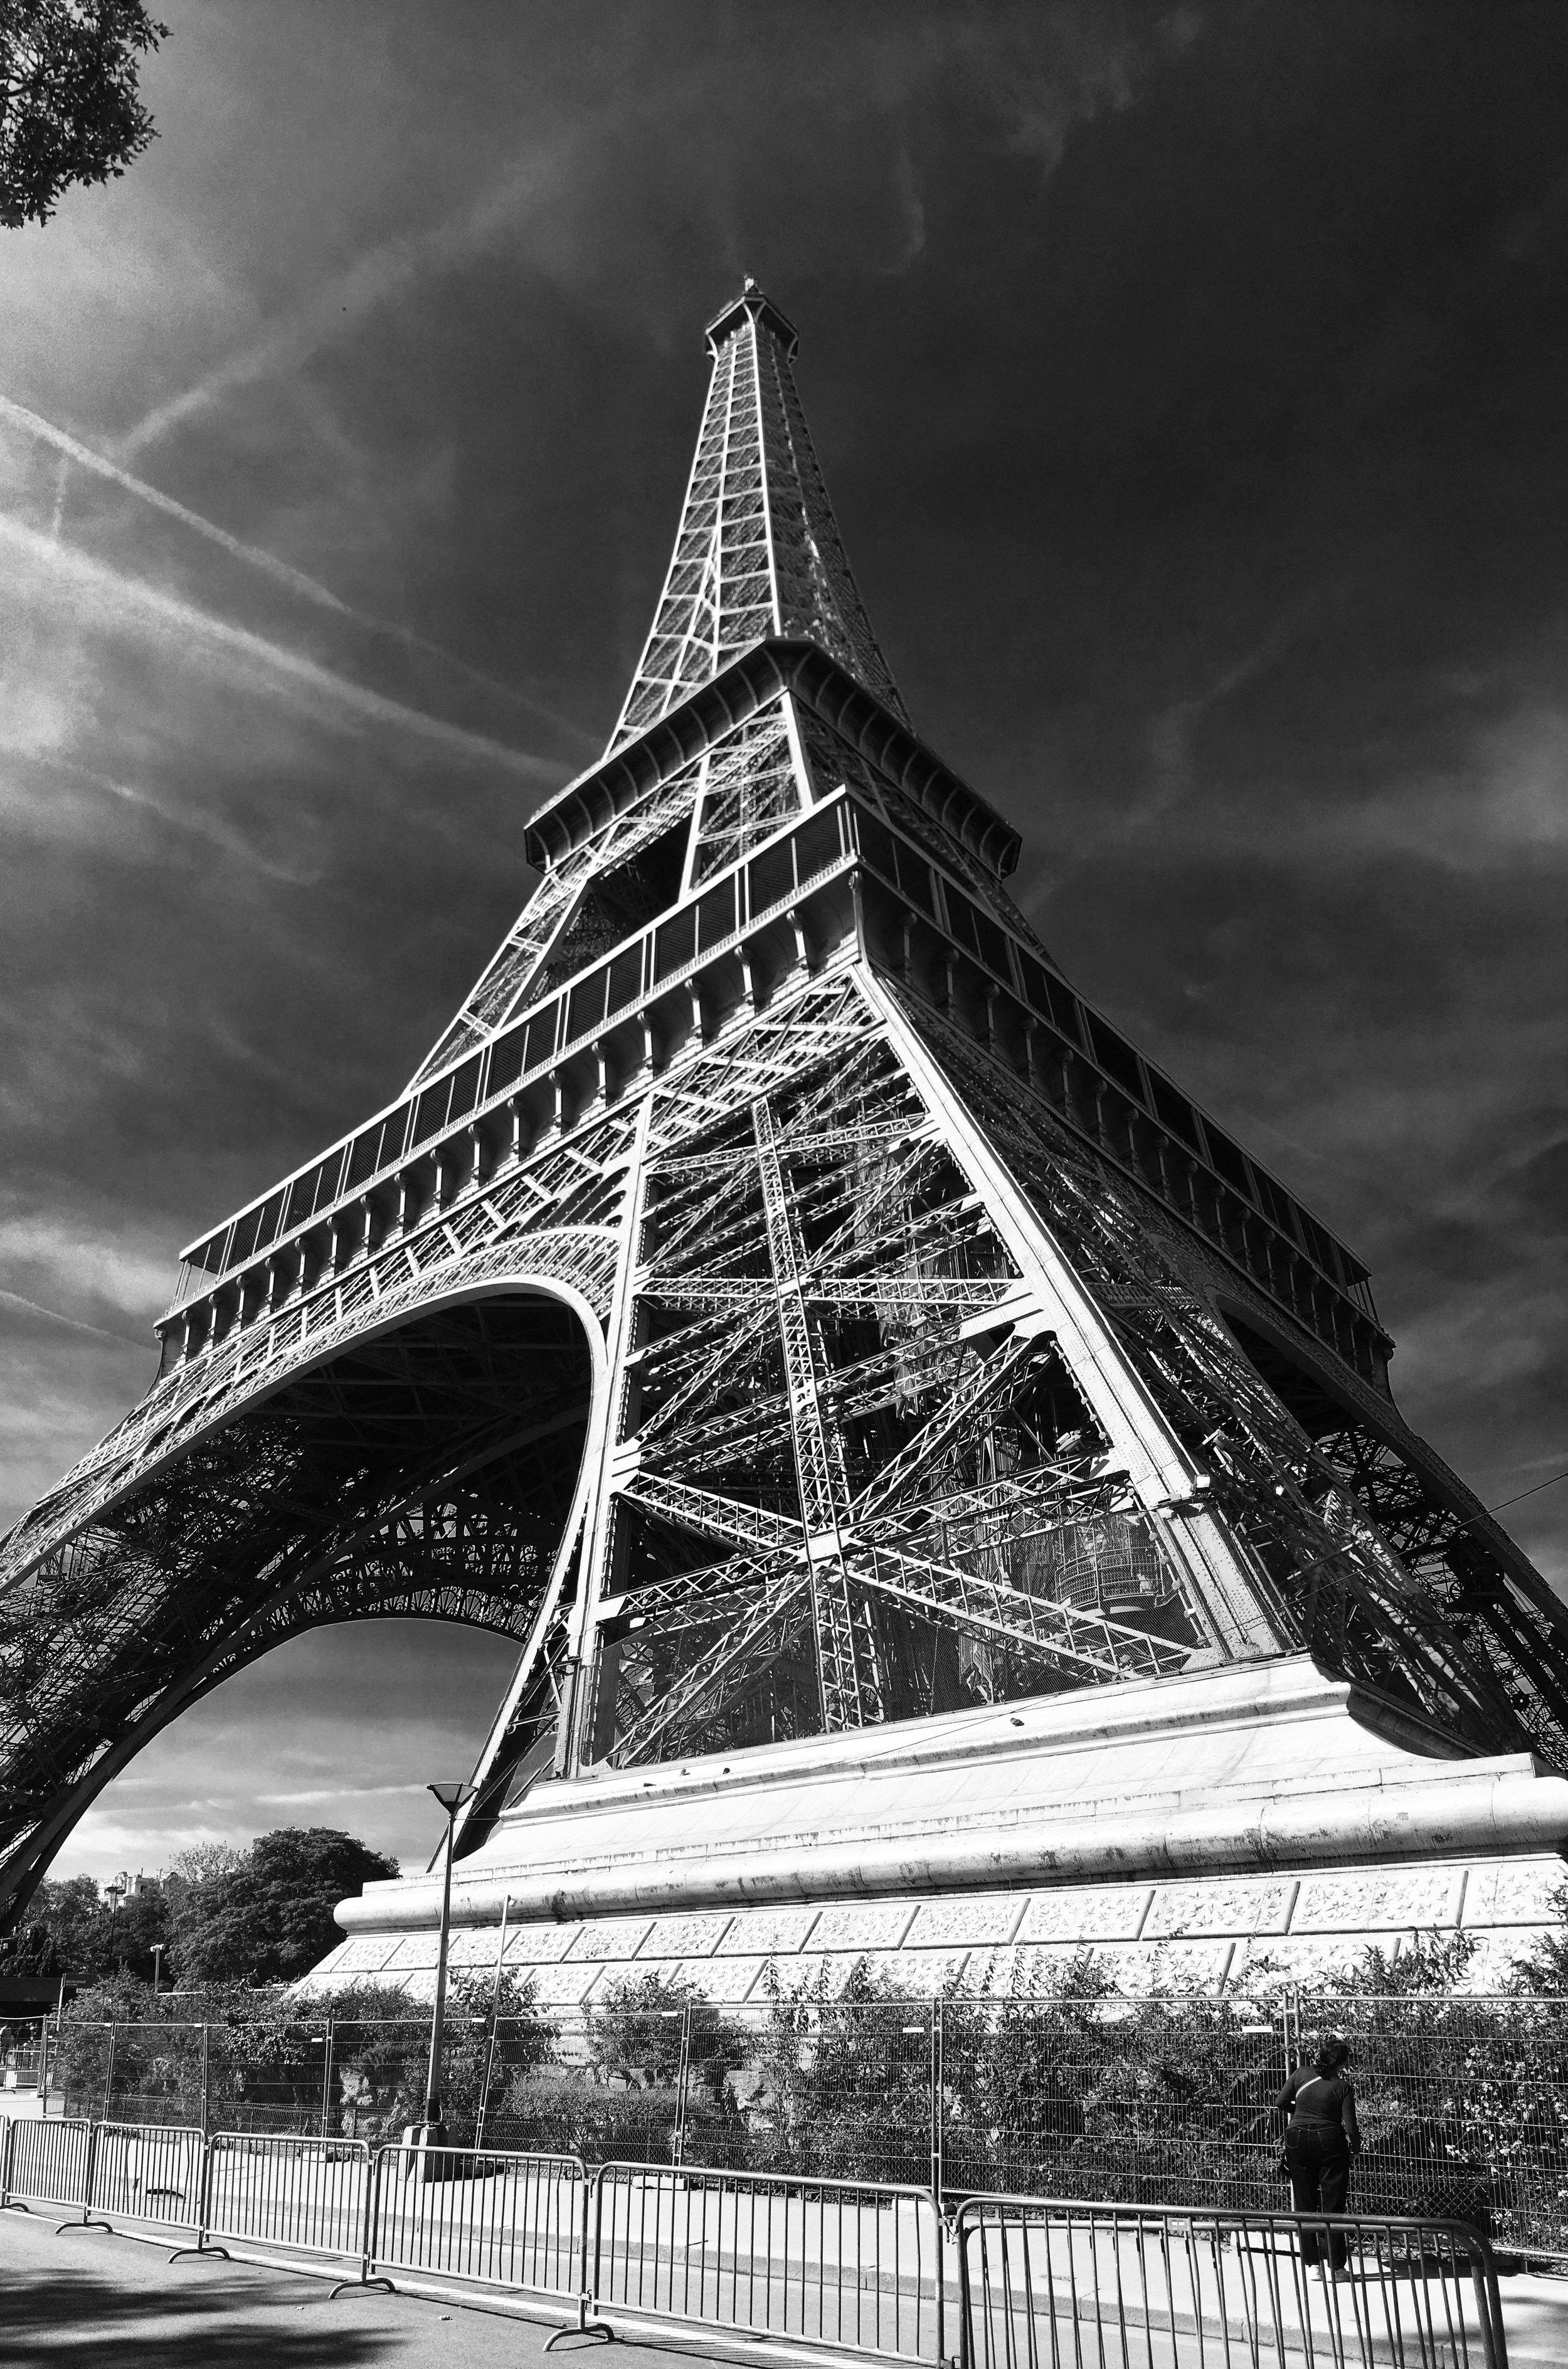 Tom_Oliver_Payne_London_to_Paris_Cycle-29.jpg